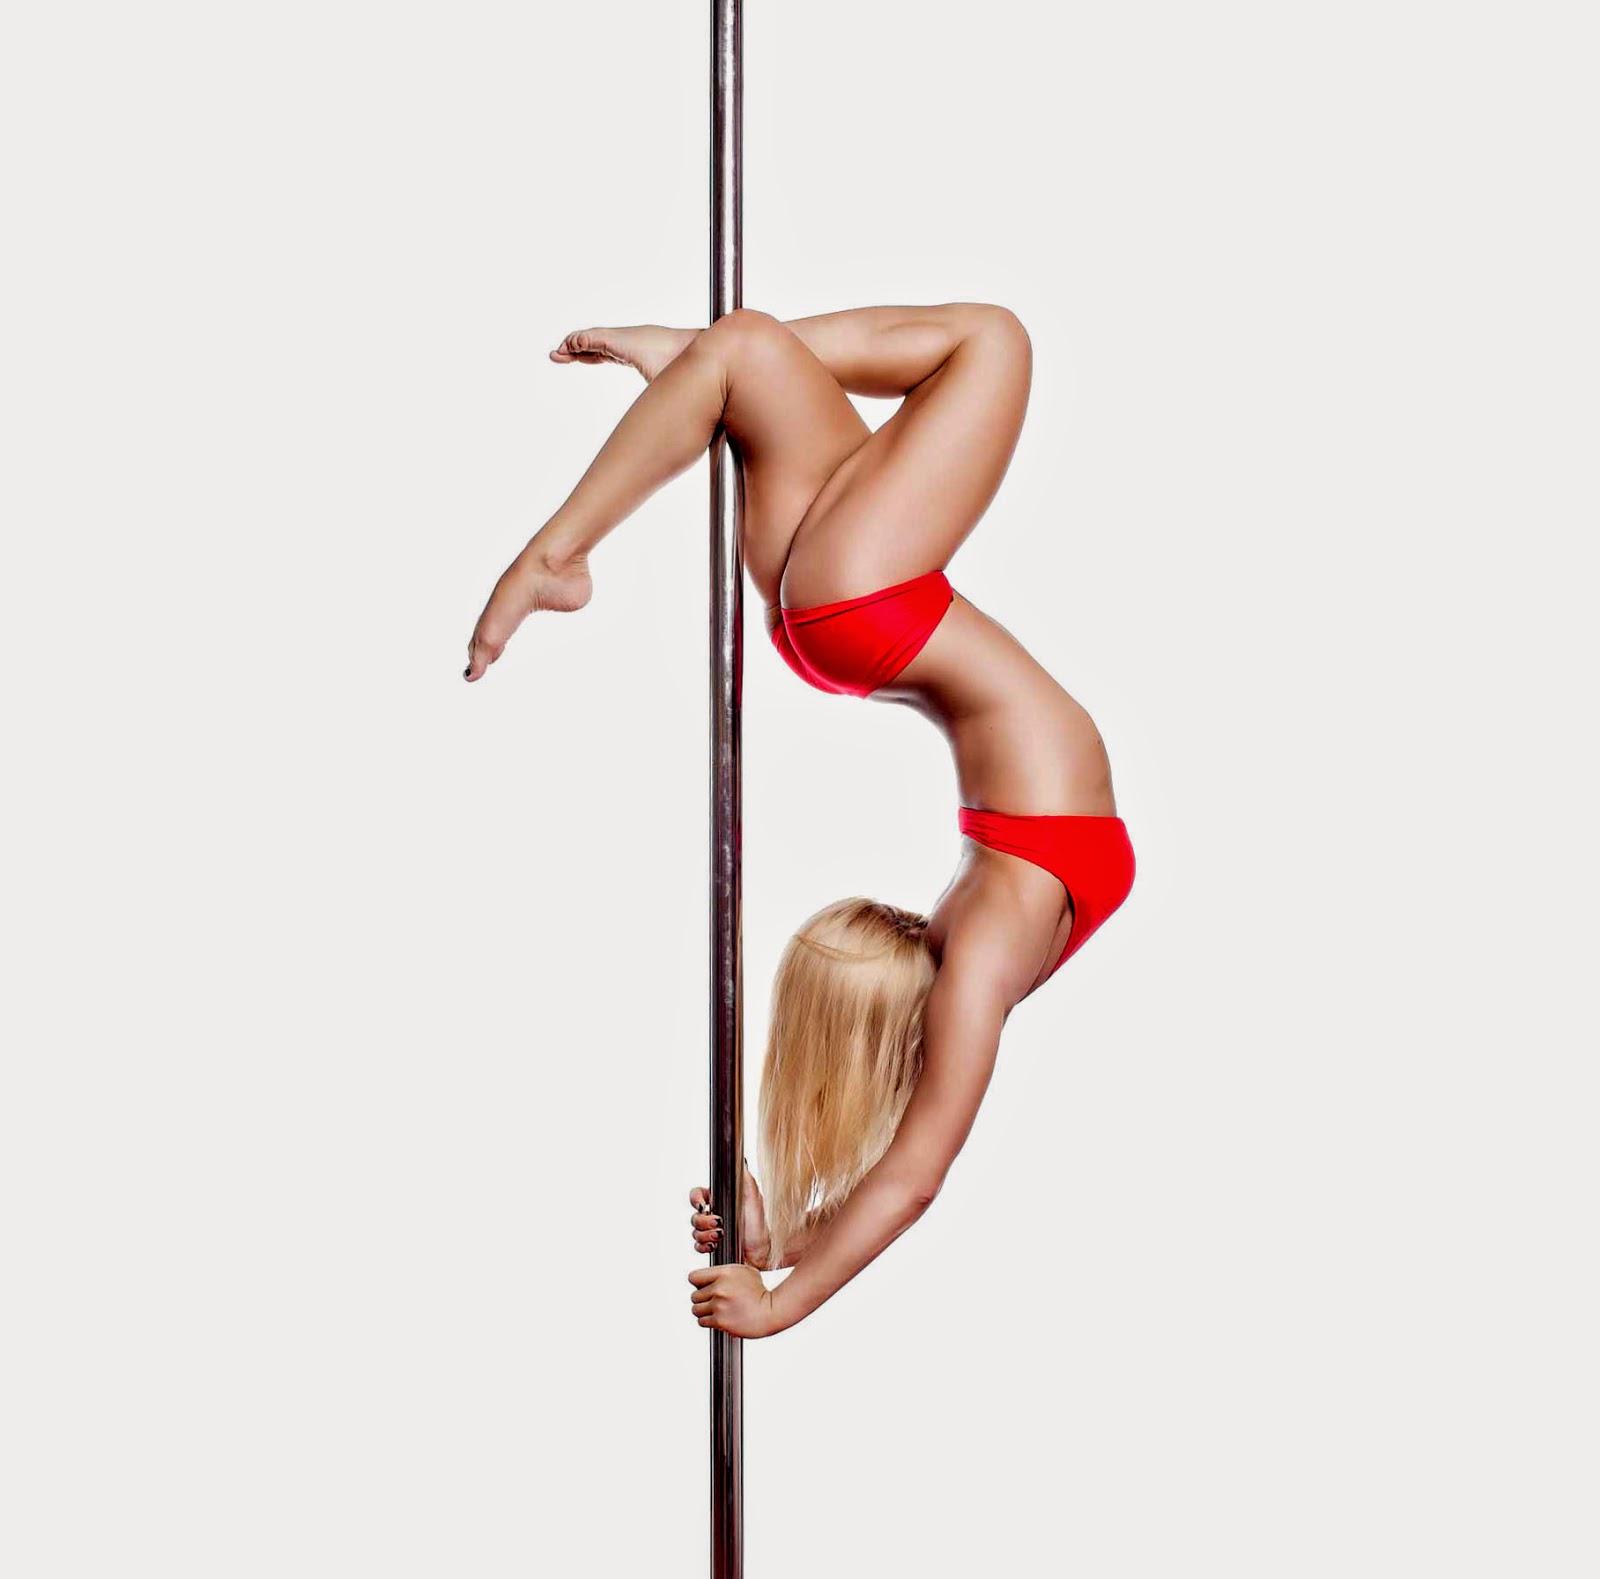 http://espacioalmargen.blogspot.com.es/p/masterclass-pole-dance.html